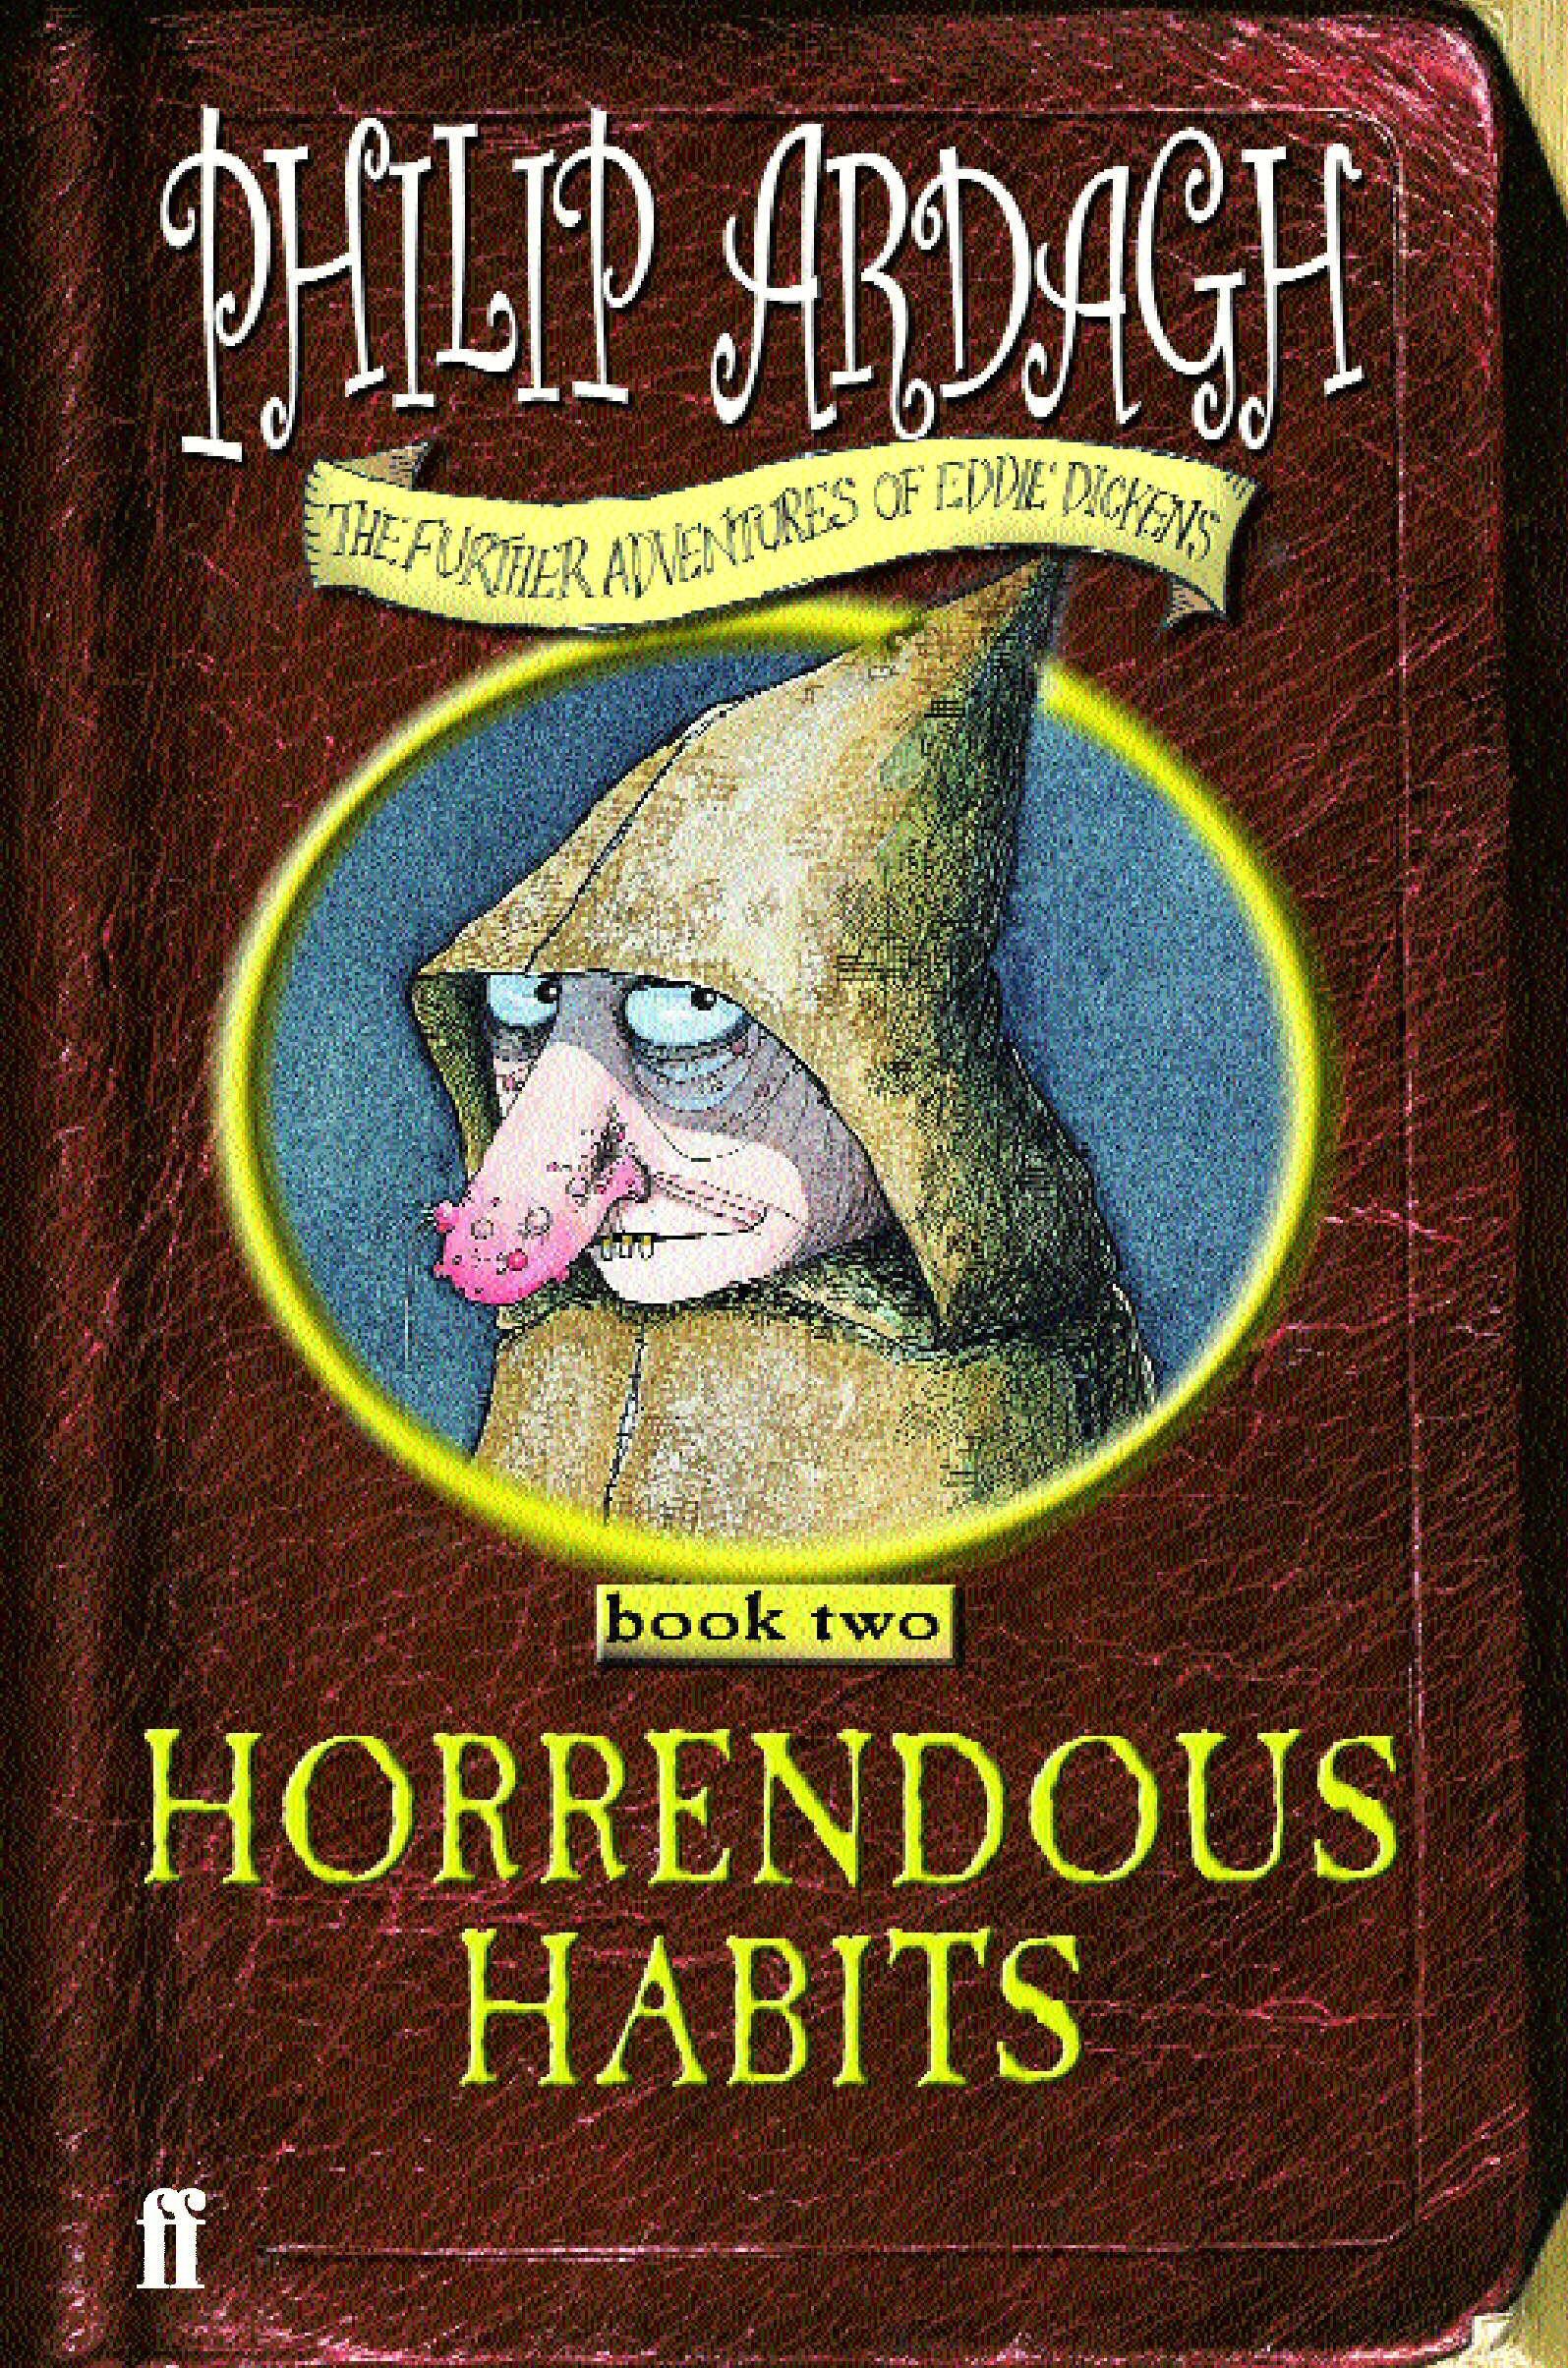 Horrendous Habits (Further Adventures of Eddie Dickens, Book 2) pdf